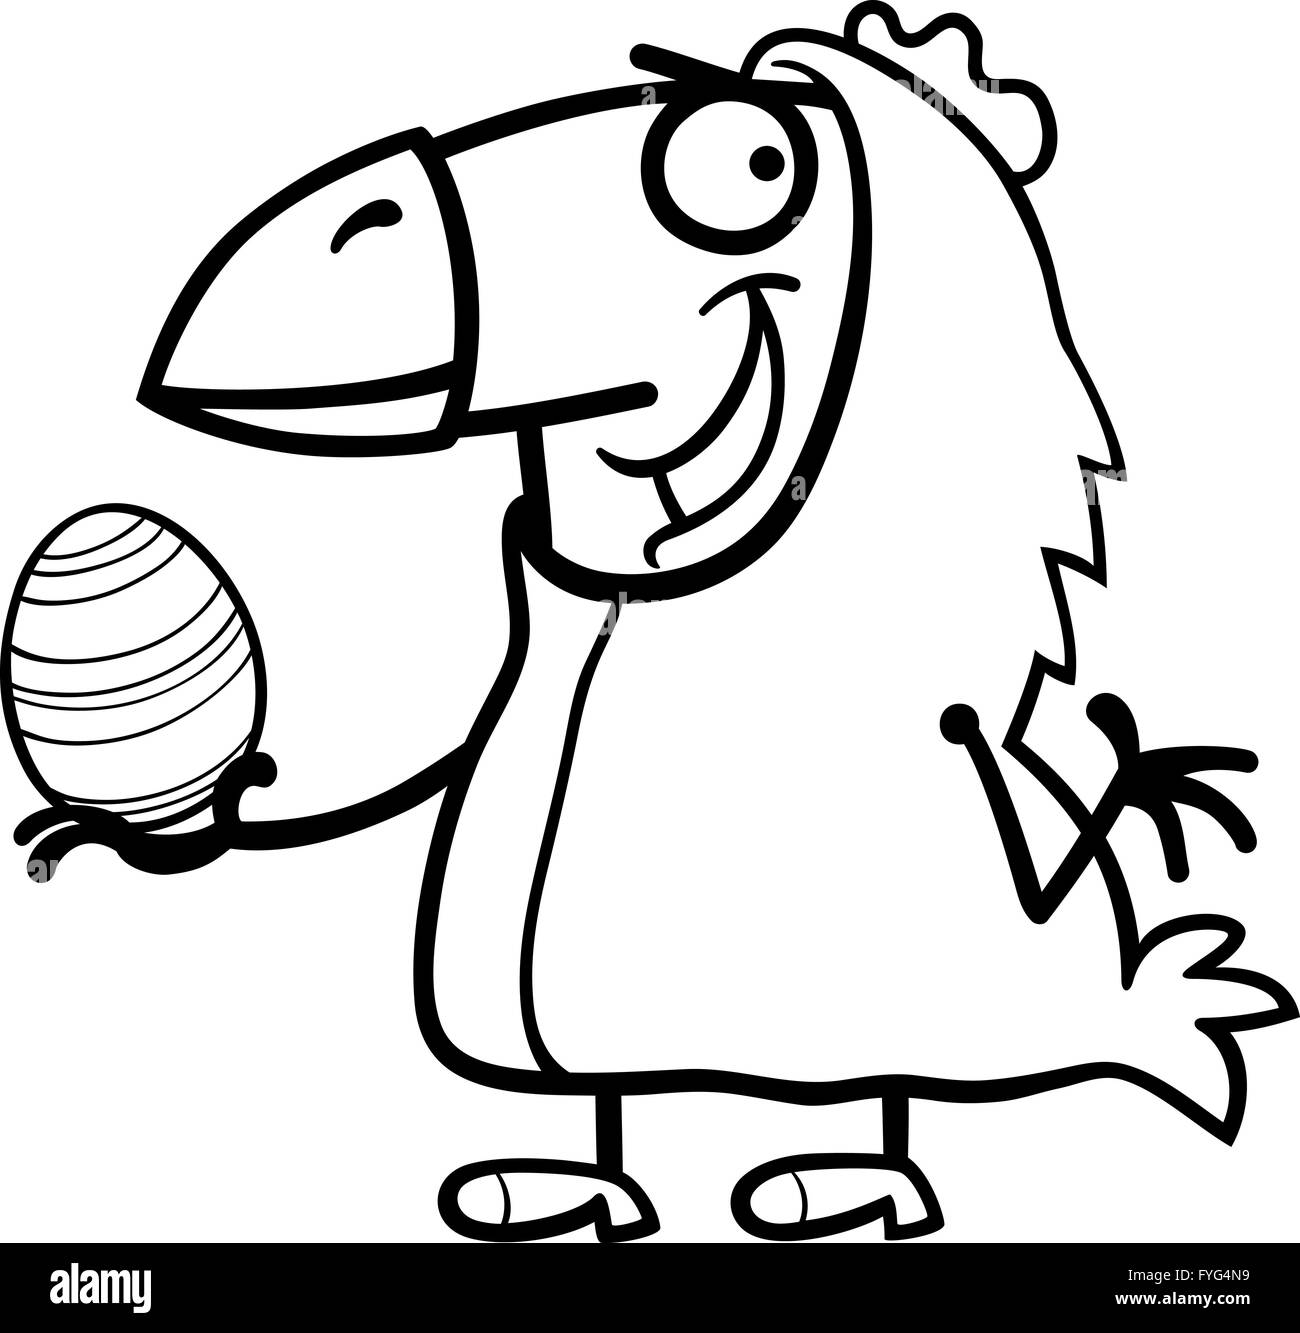 Cartoon Character Chicken Stockfotos & Cartoon Character Chicken ...